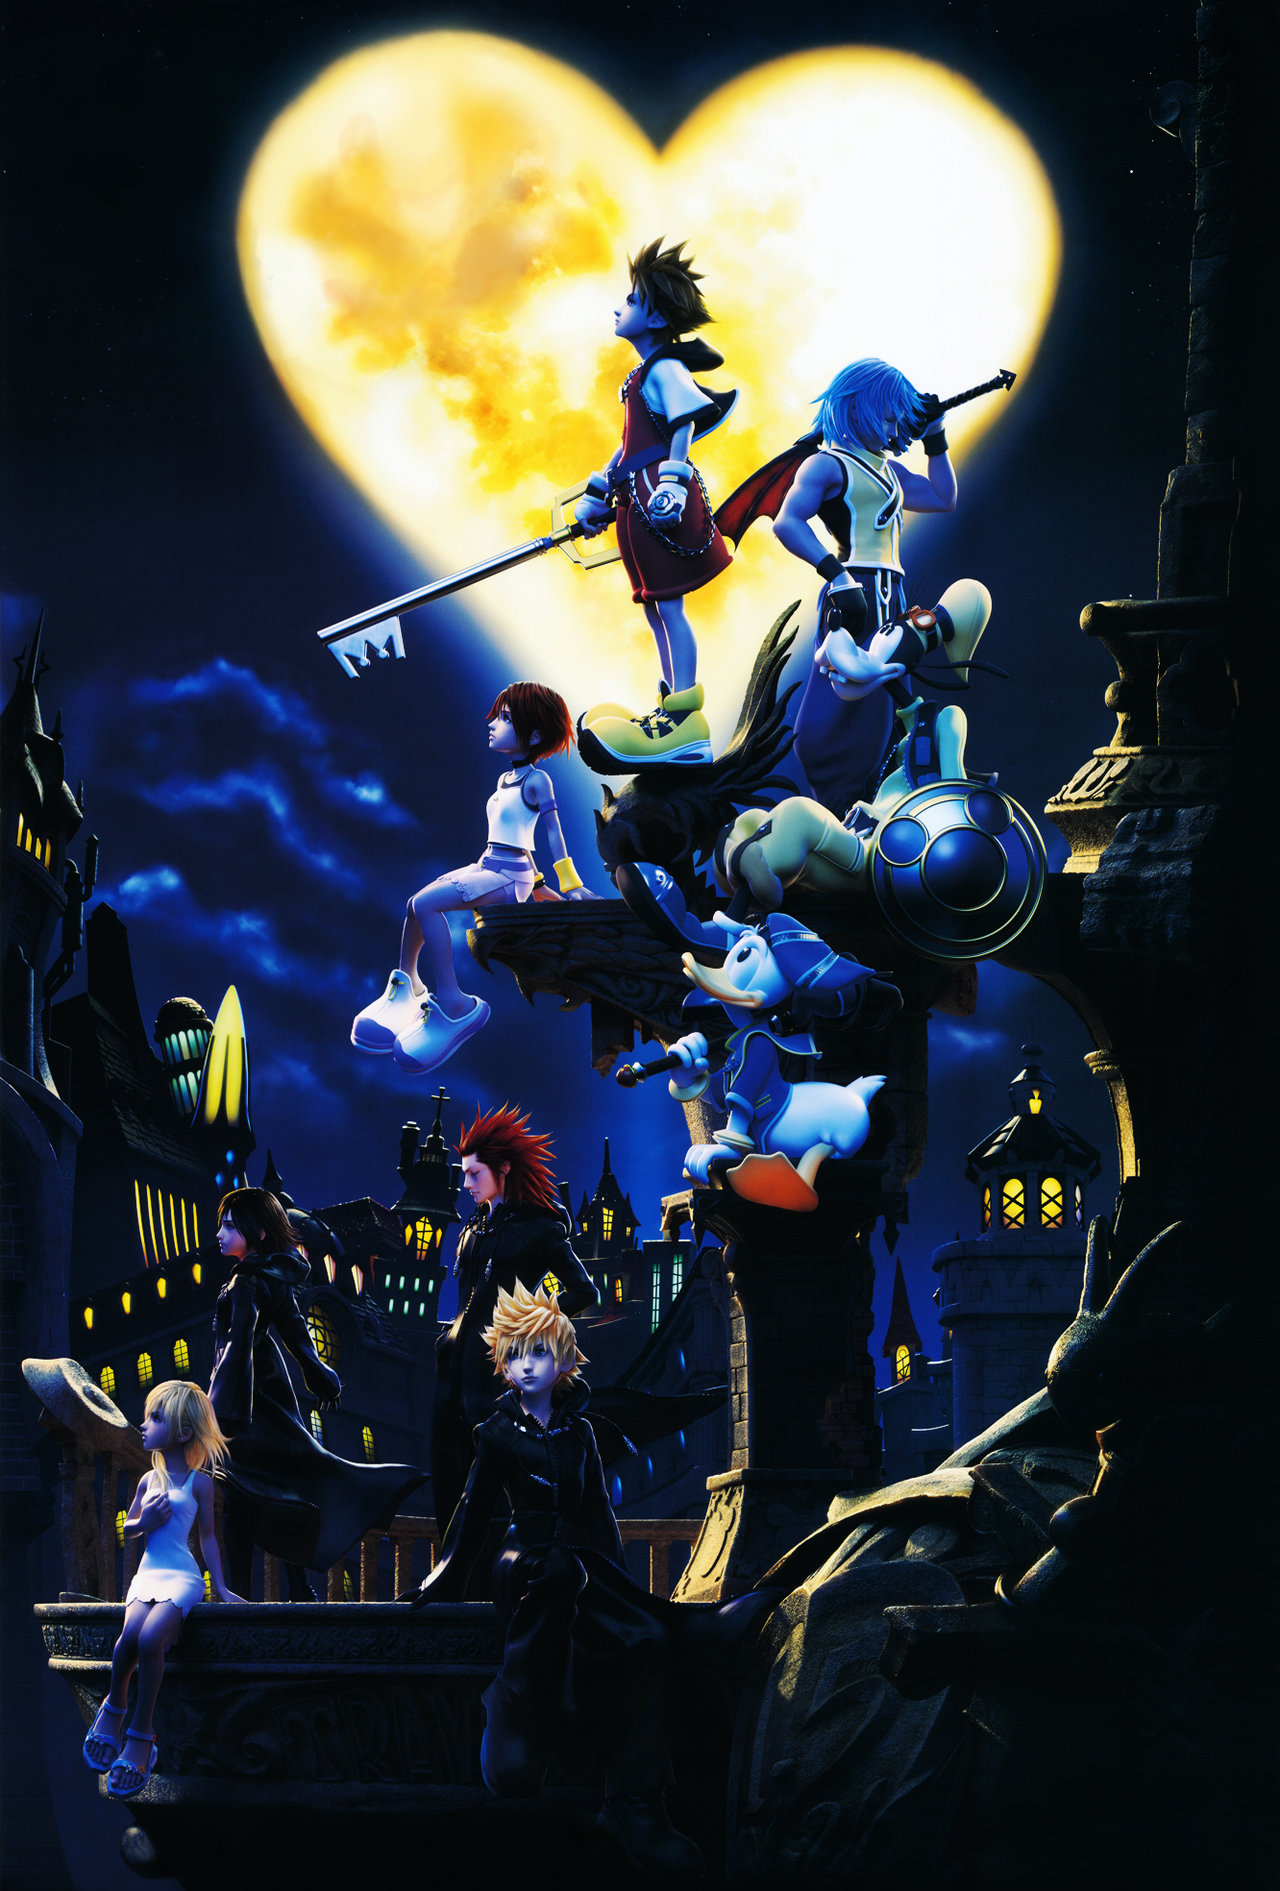 Kingdom Hearts HD CG Wallpaper by DanChaos1 1280x1891